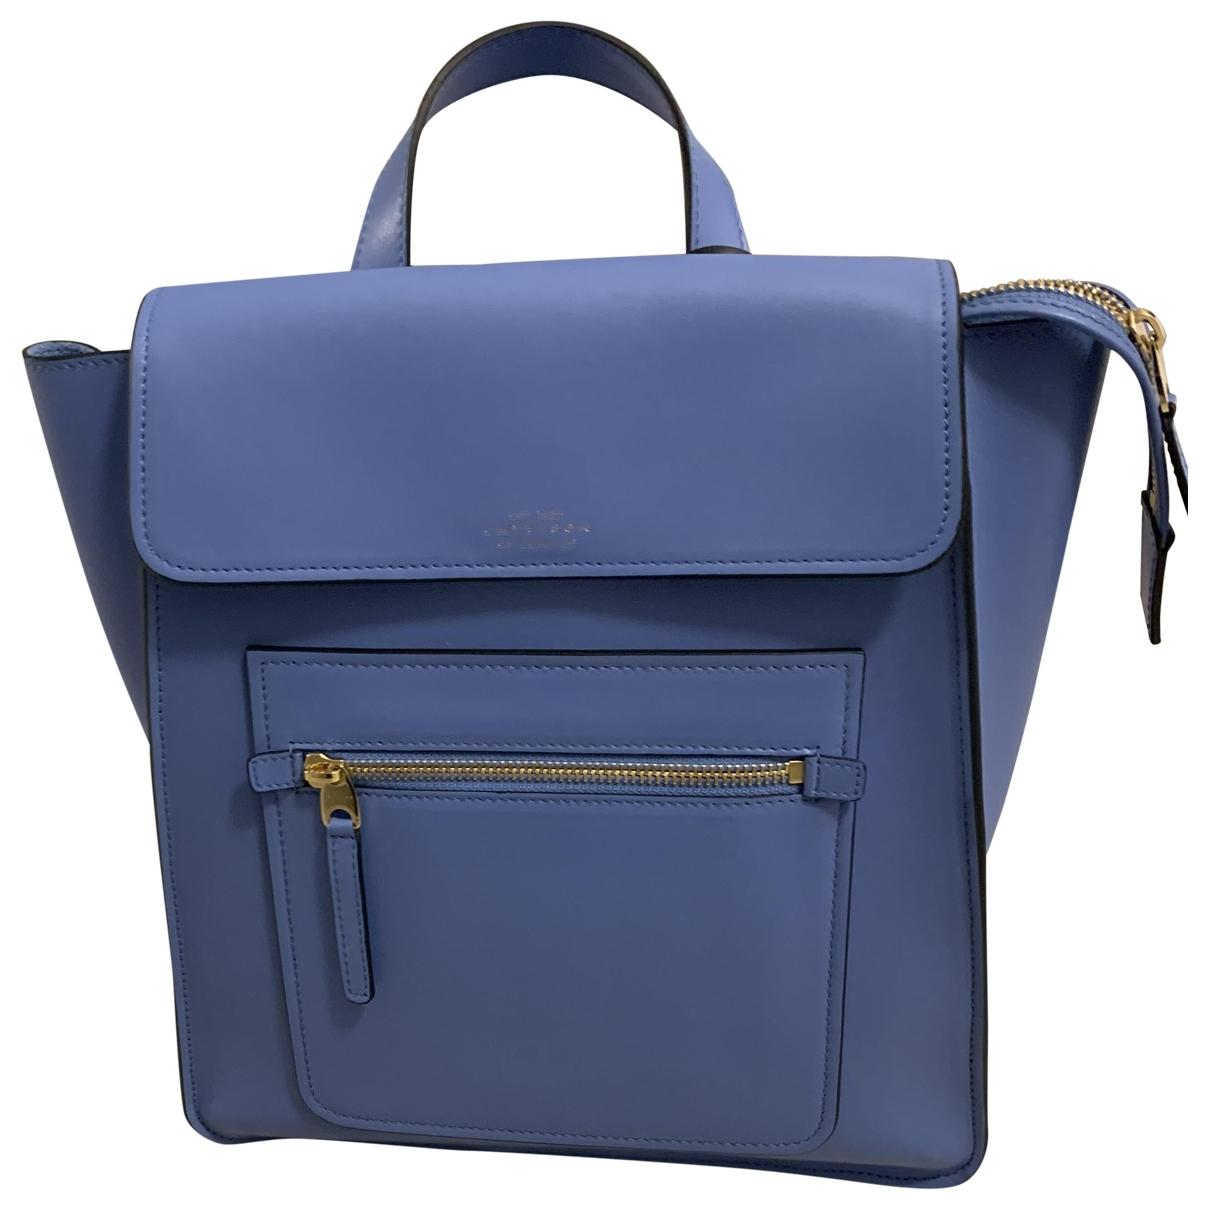 Smythson - Sac a dos   pour femme en cuir - bleu